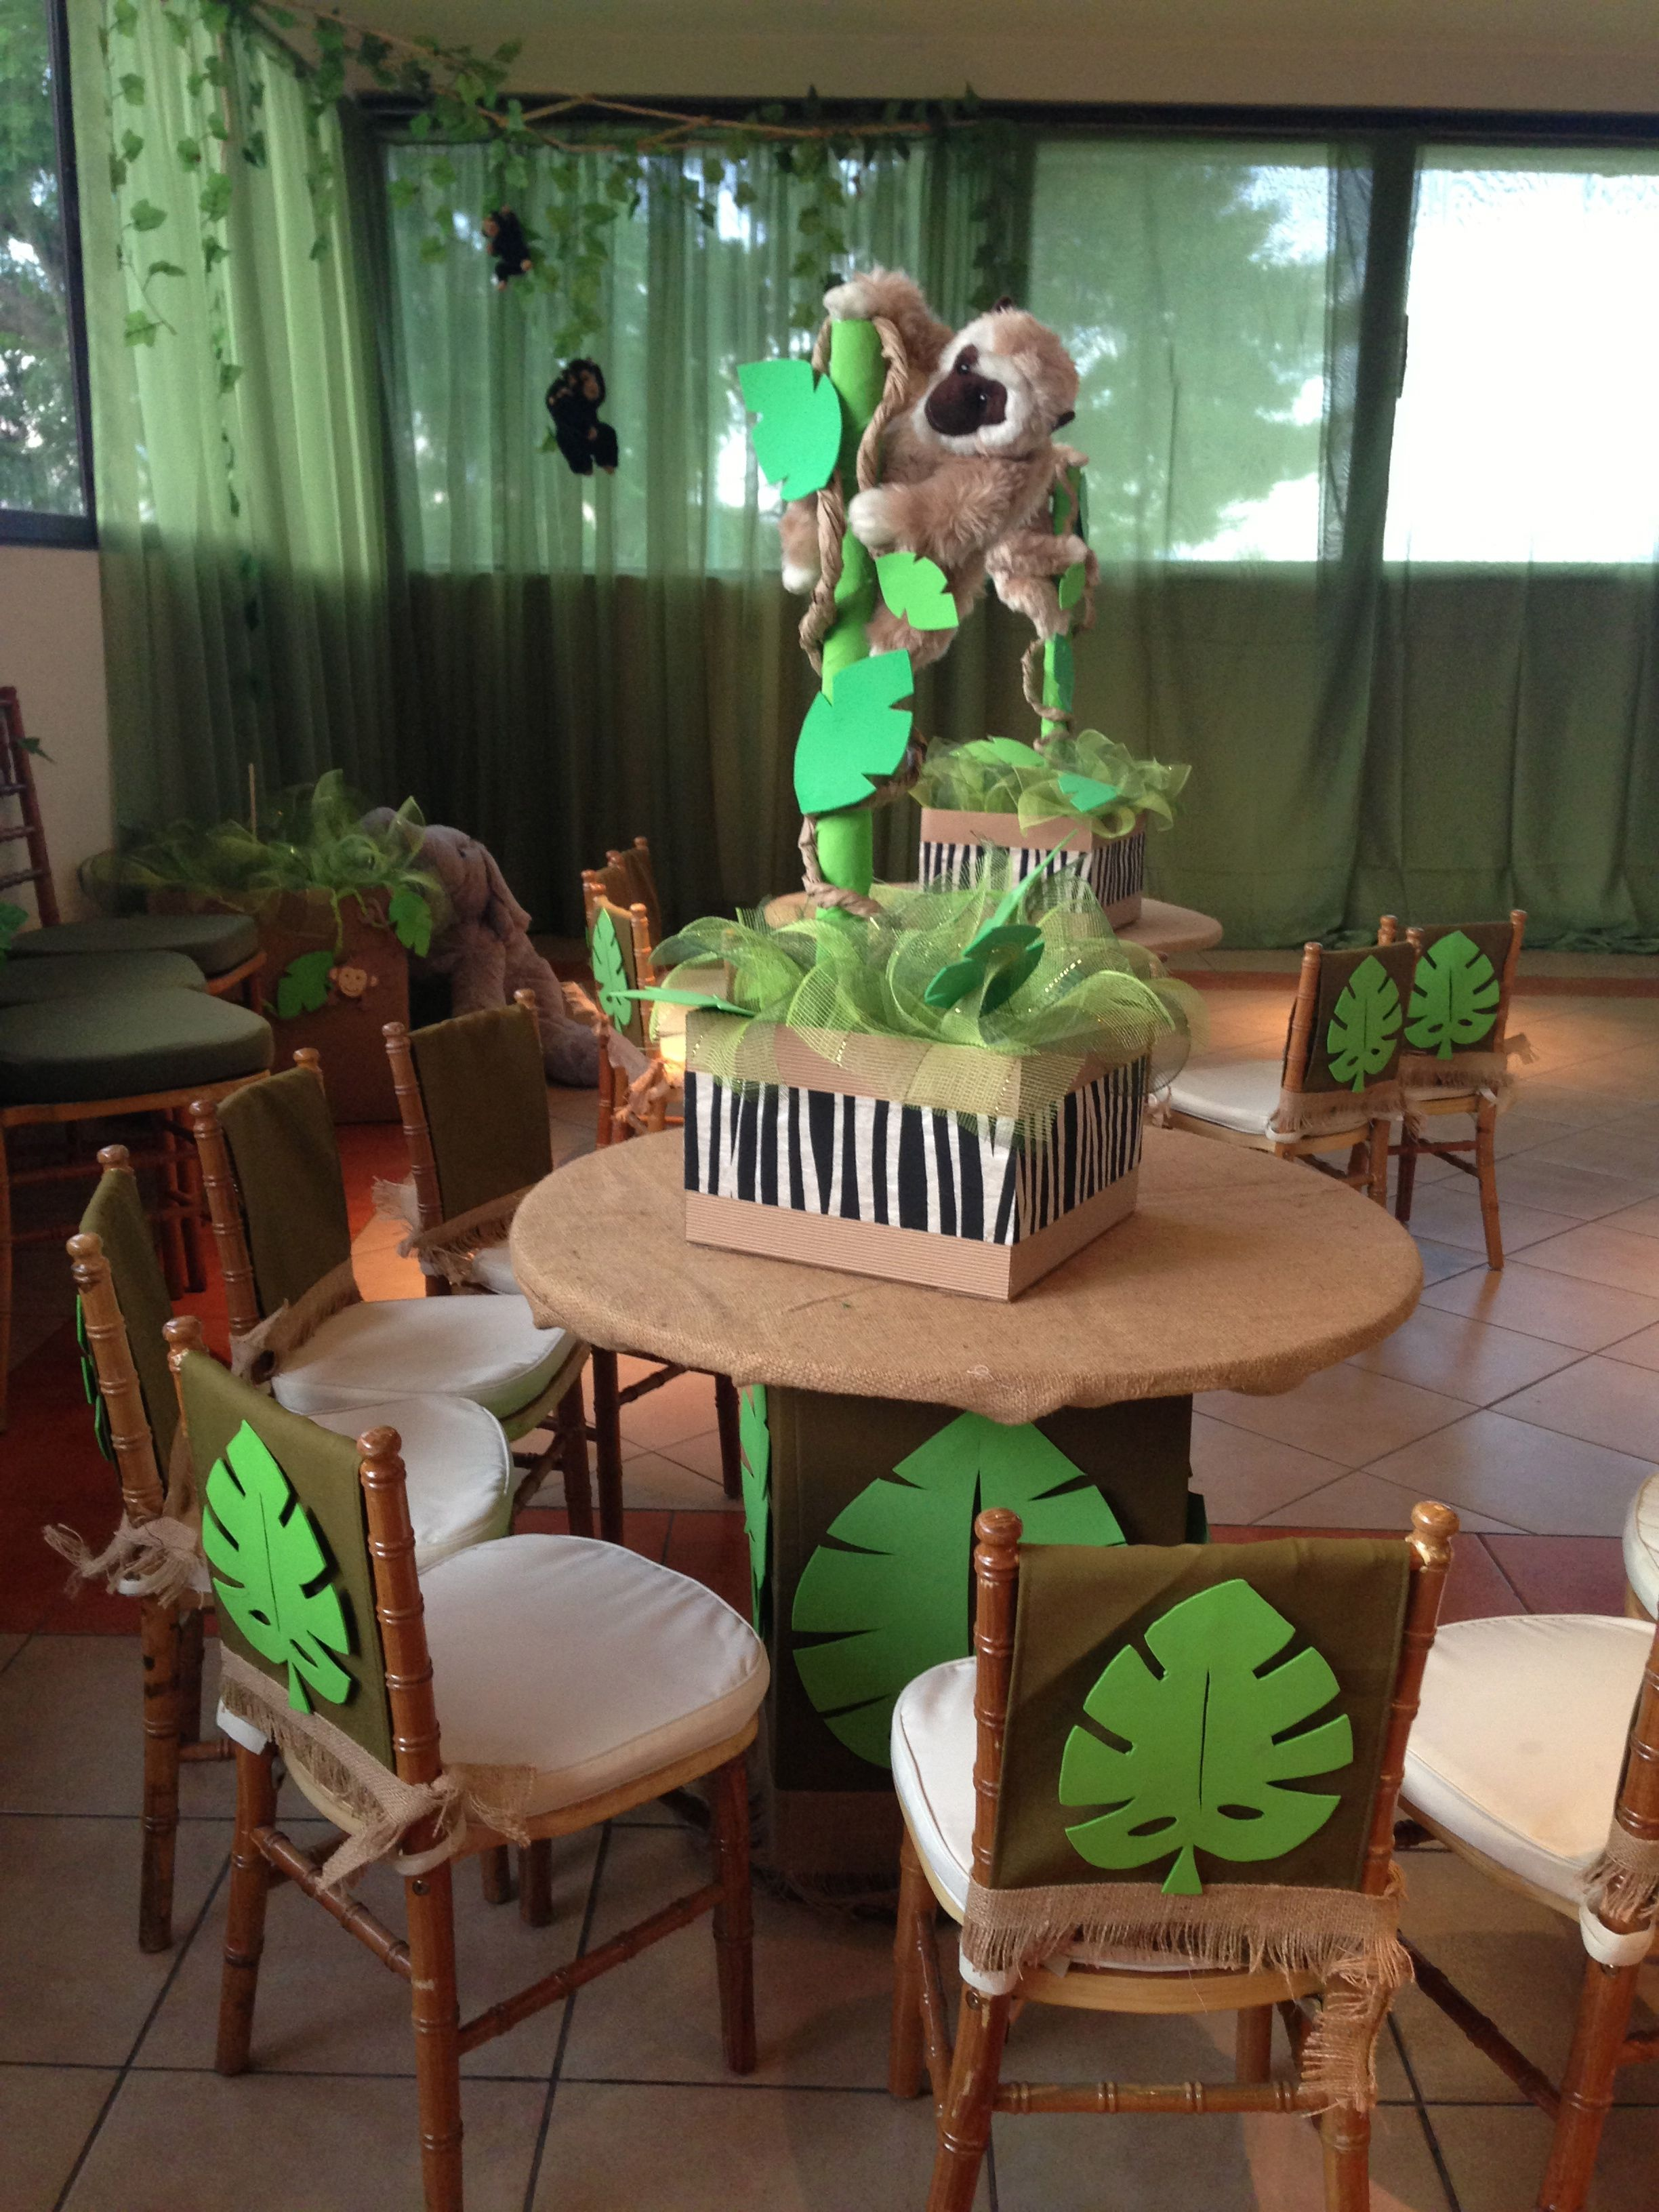 Decoracion infantil fiesta jungla eventos by bsquare - Decoracion fiestas infantiles ...